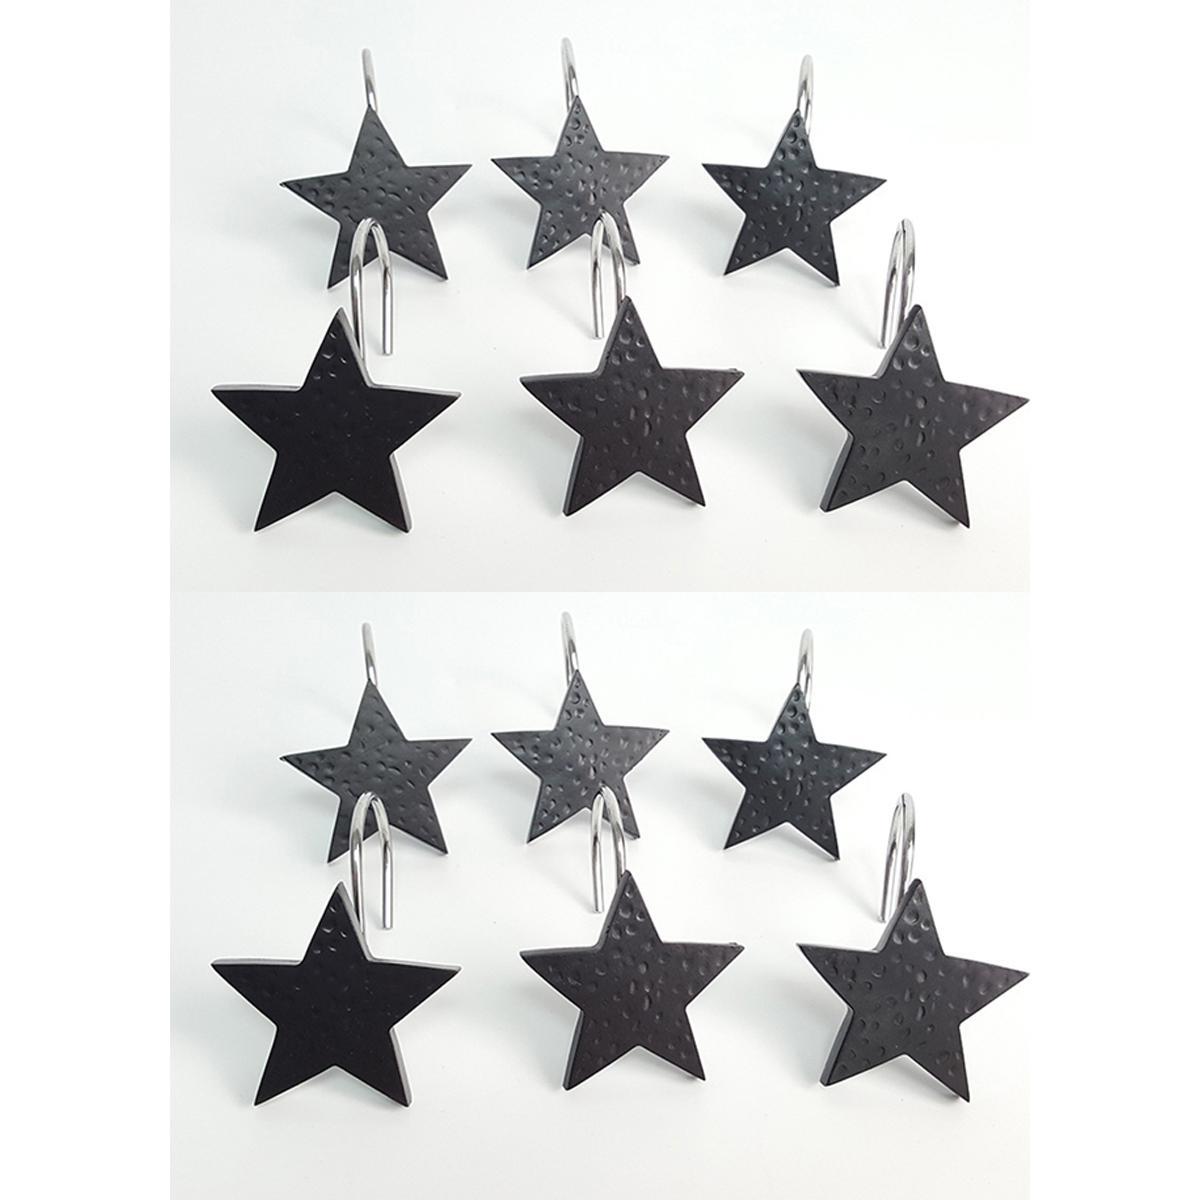 12pcs Black Star Shower Curtain Hooks Hanging Hook Bathroom Decor